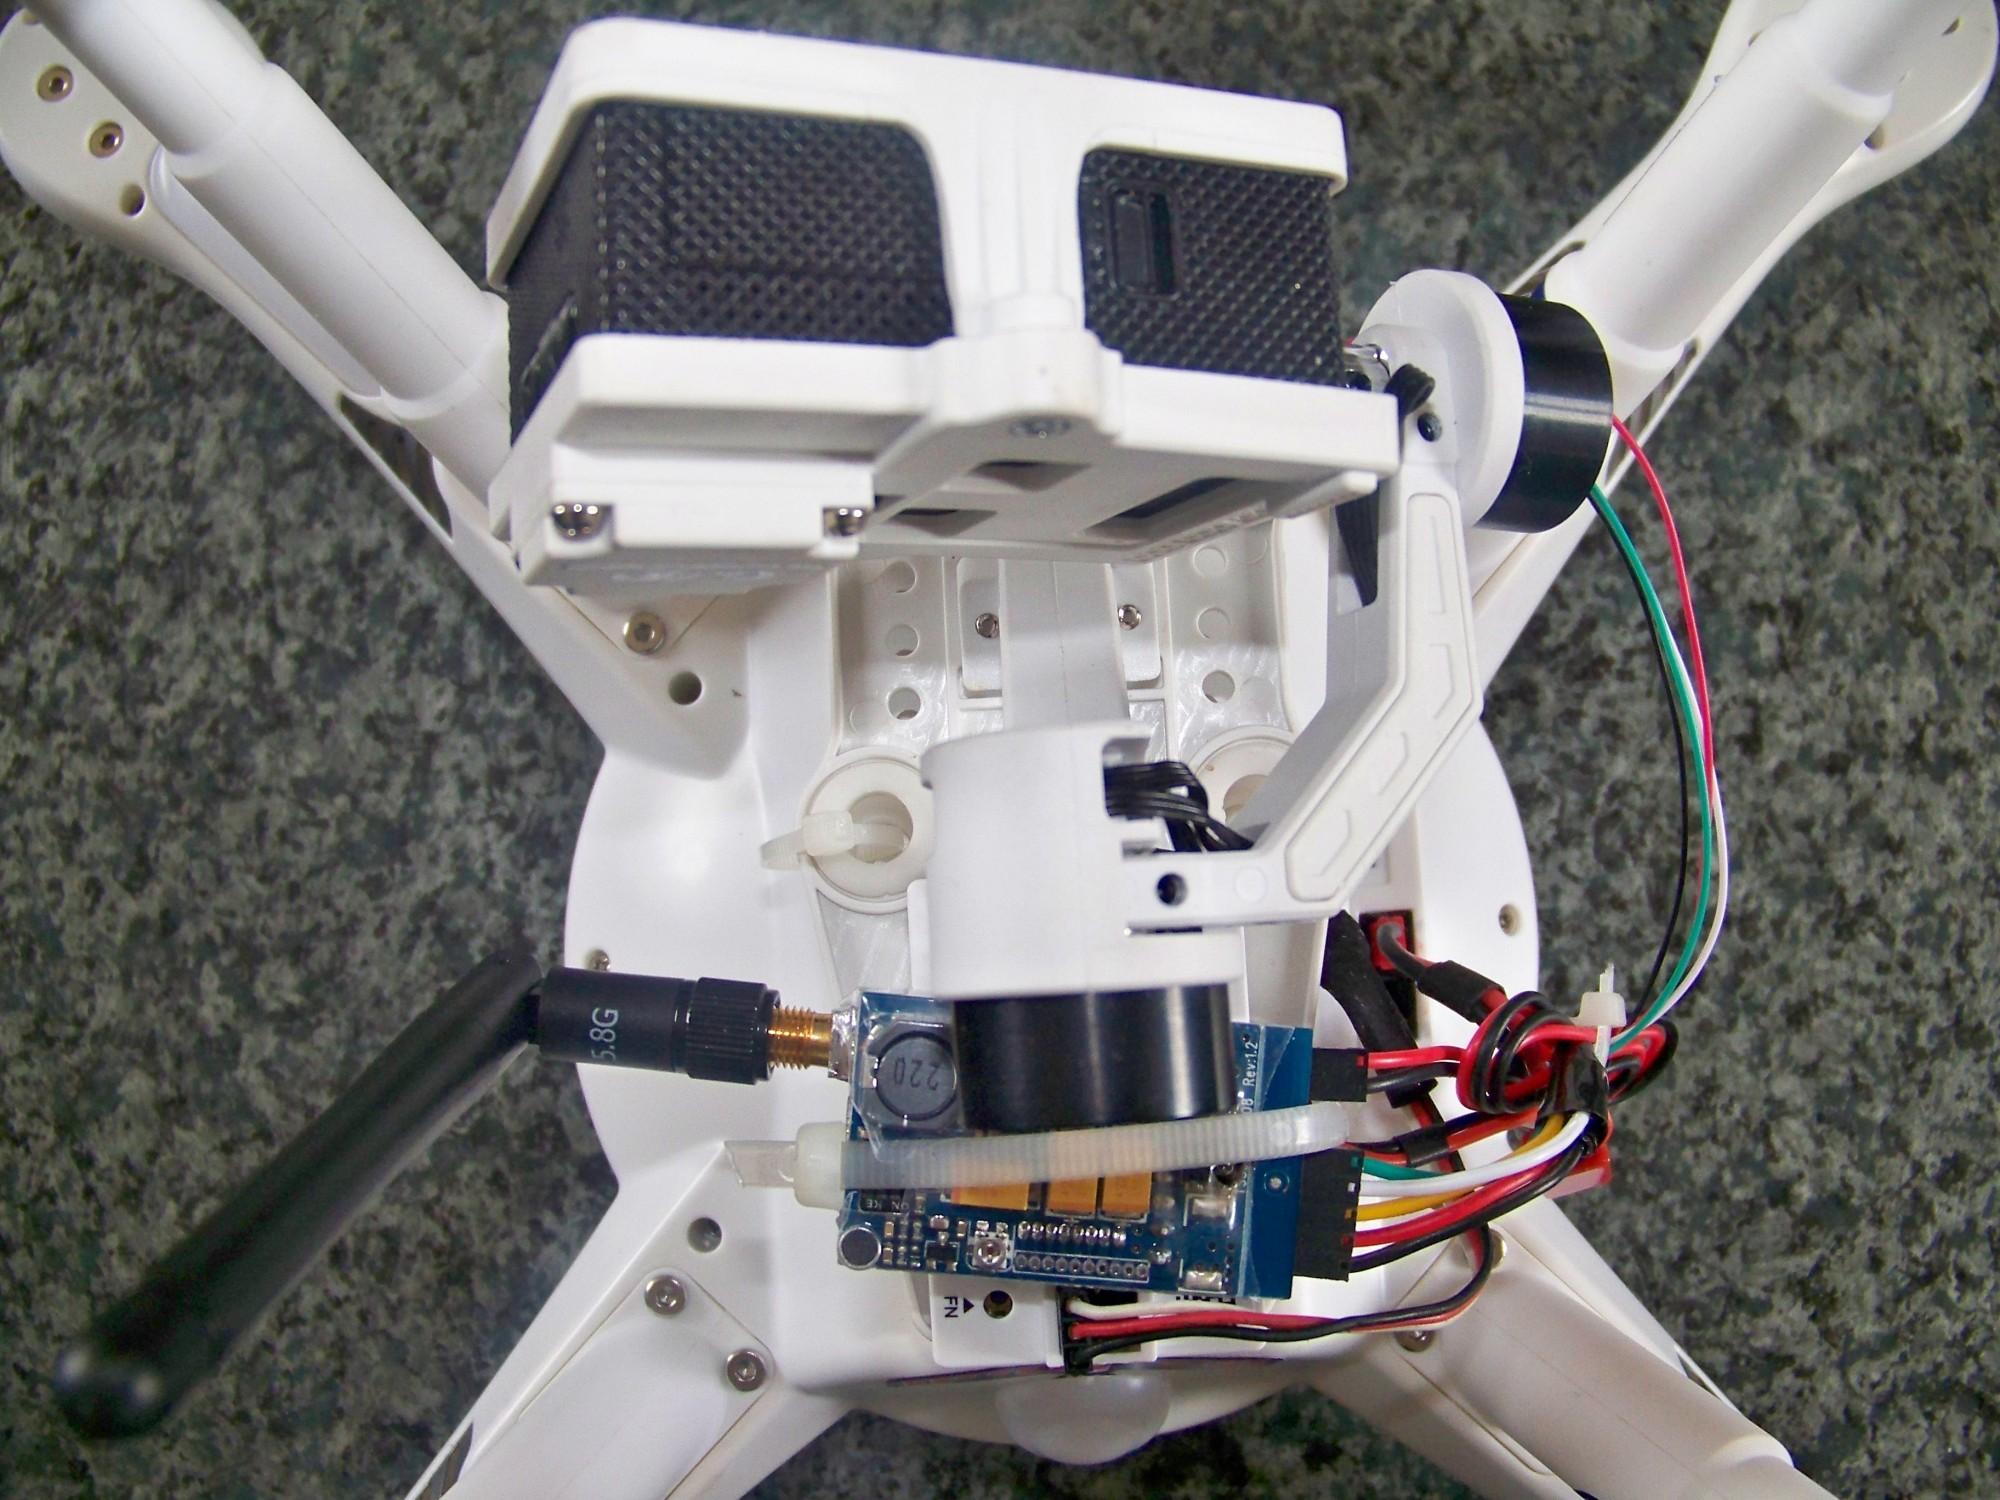 Boscam T353 5.8ghz